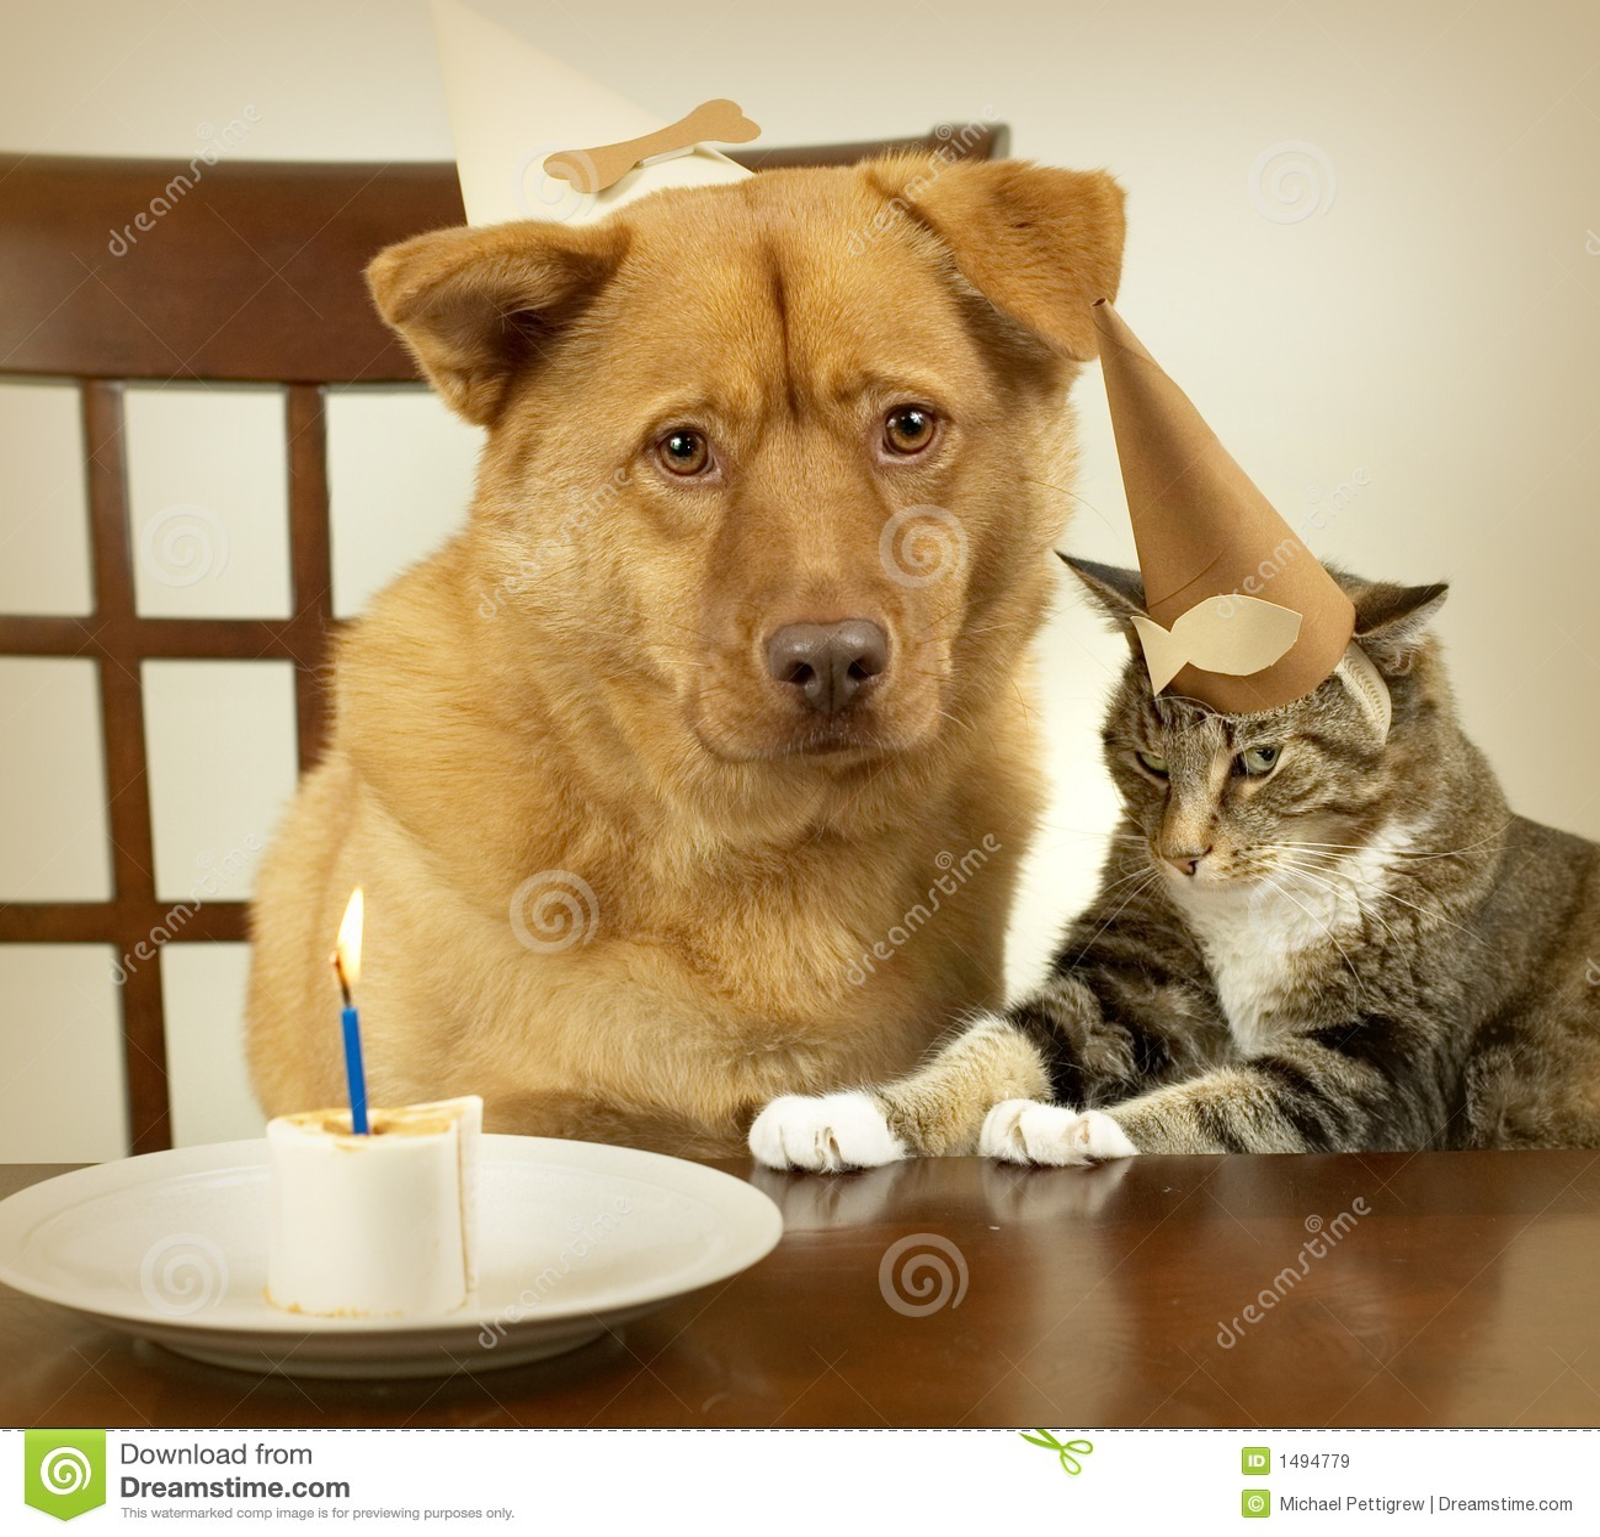 Hallmark Blanko Karte Geburtstag Katze Medium Amazon De